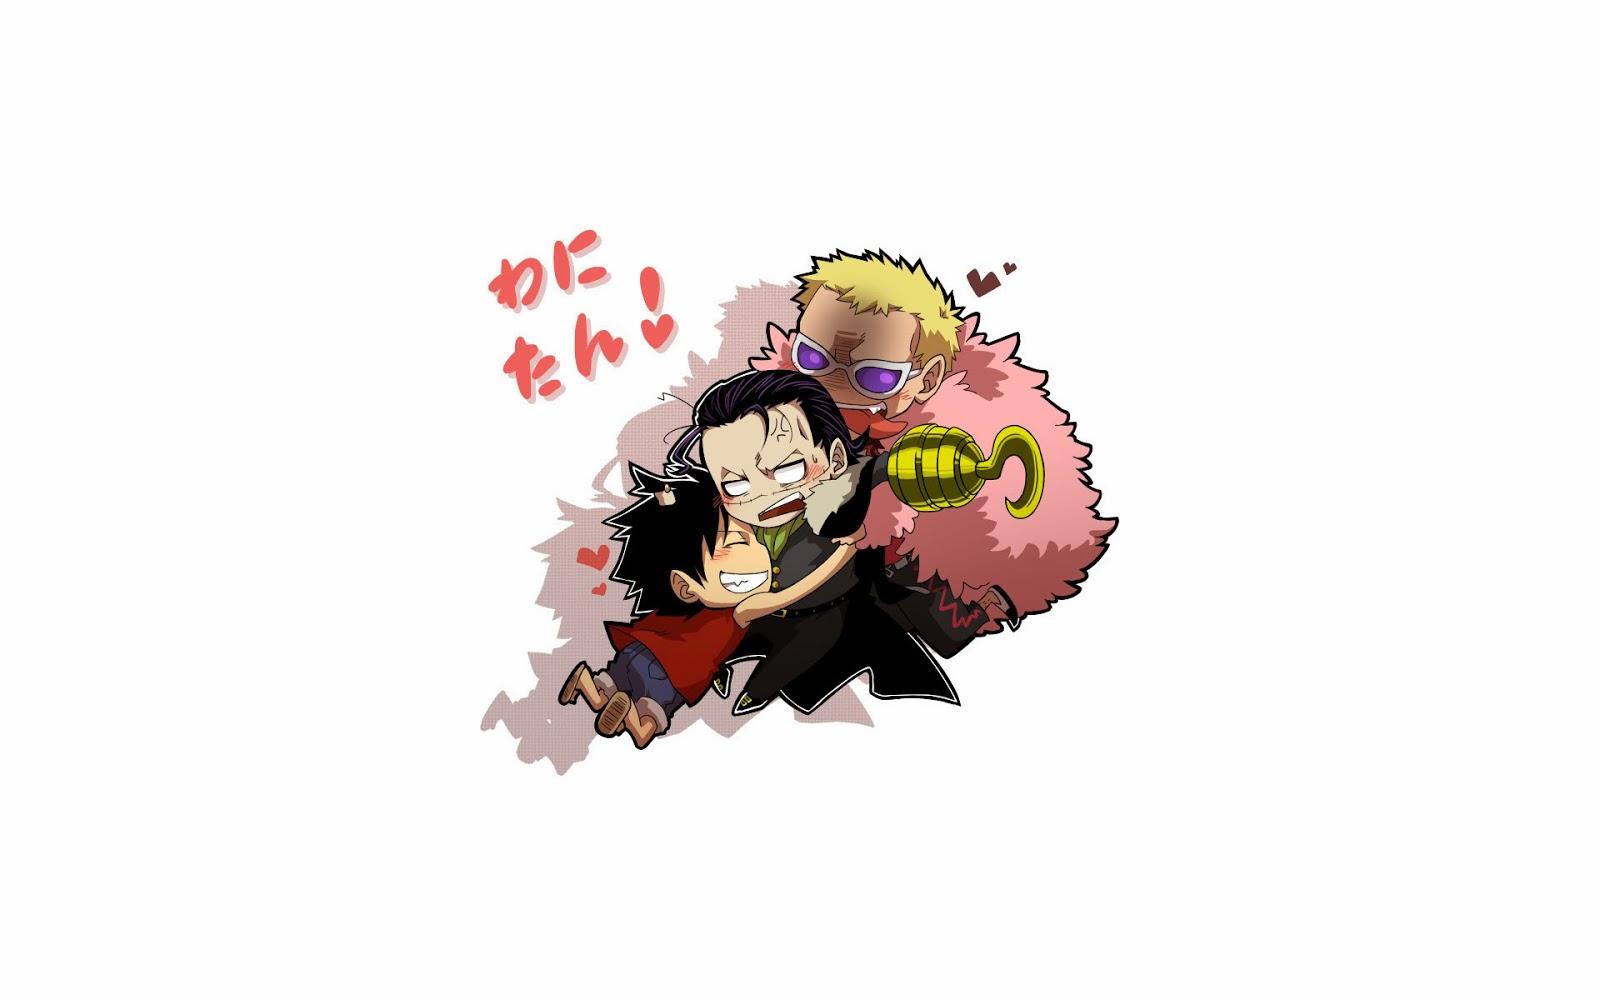 Free Download Monkey D Luffy Crocodile Doflamingo Wallpaper Hd Chibi One Piece Anime 1600x1000 For Your Desktop Mobile Tablet Explore 48 Doflamingo Wallpaper Luffy Vs Doflamingo Wallpaper One Piece